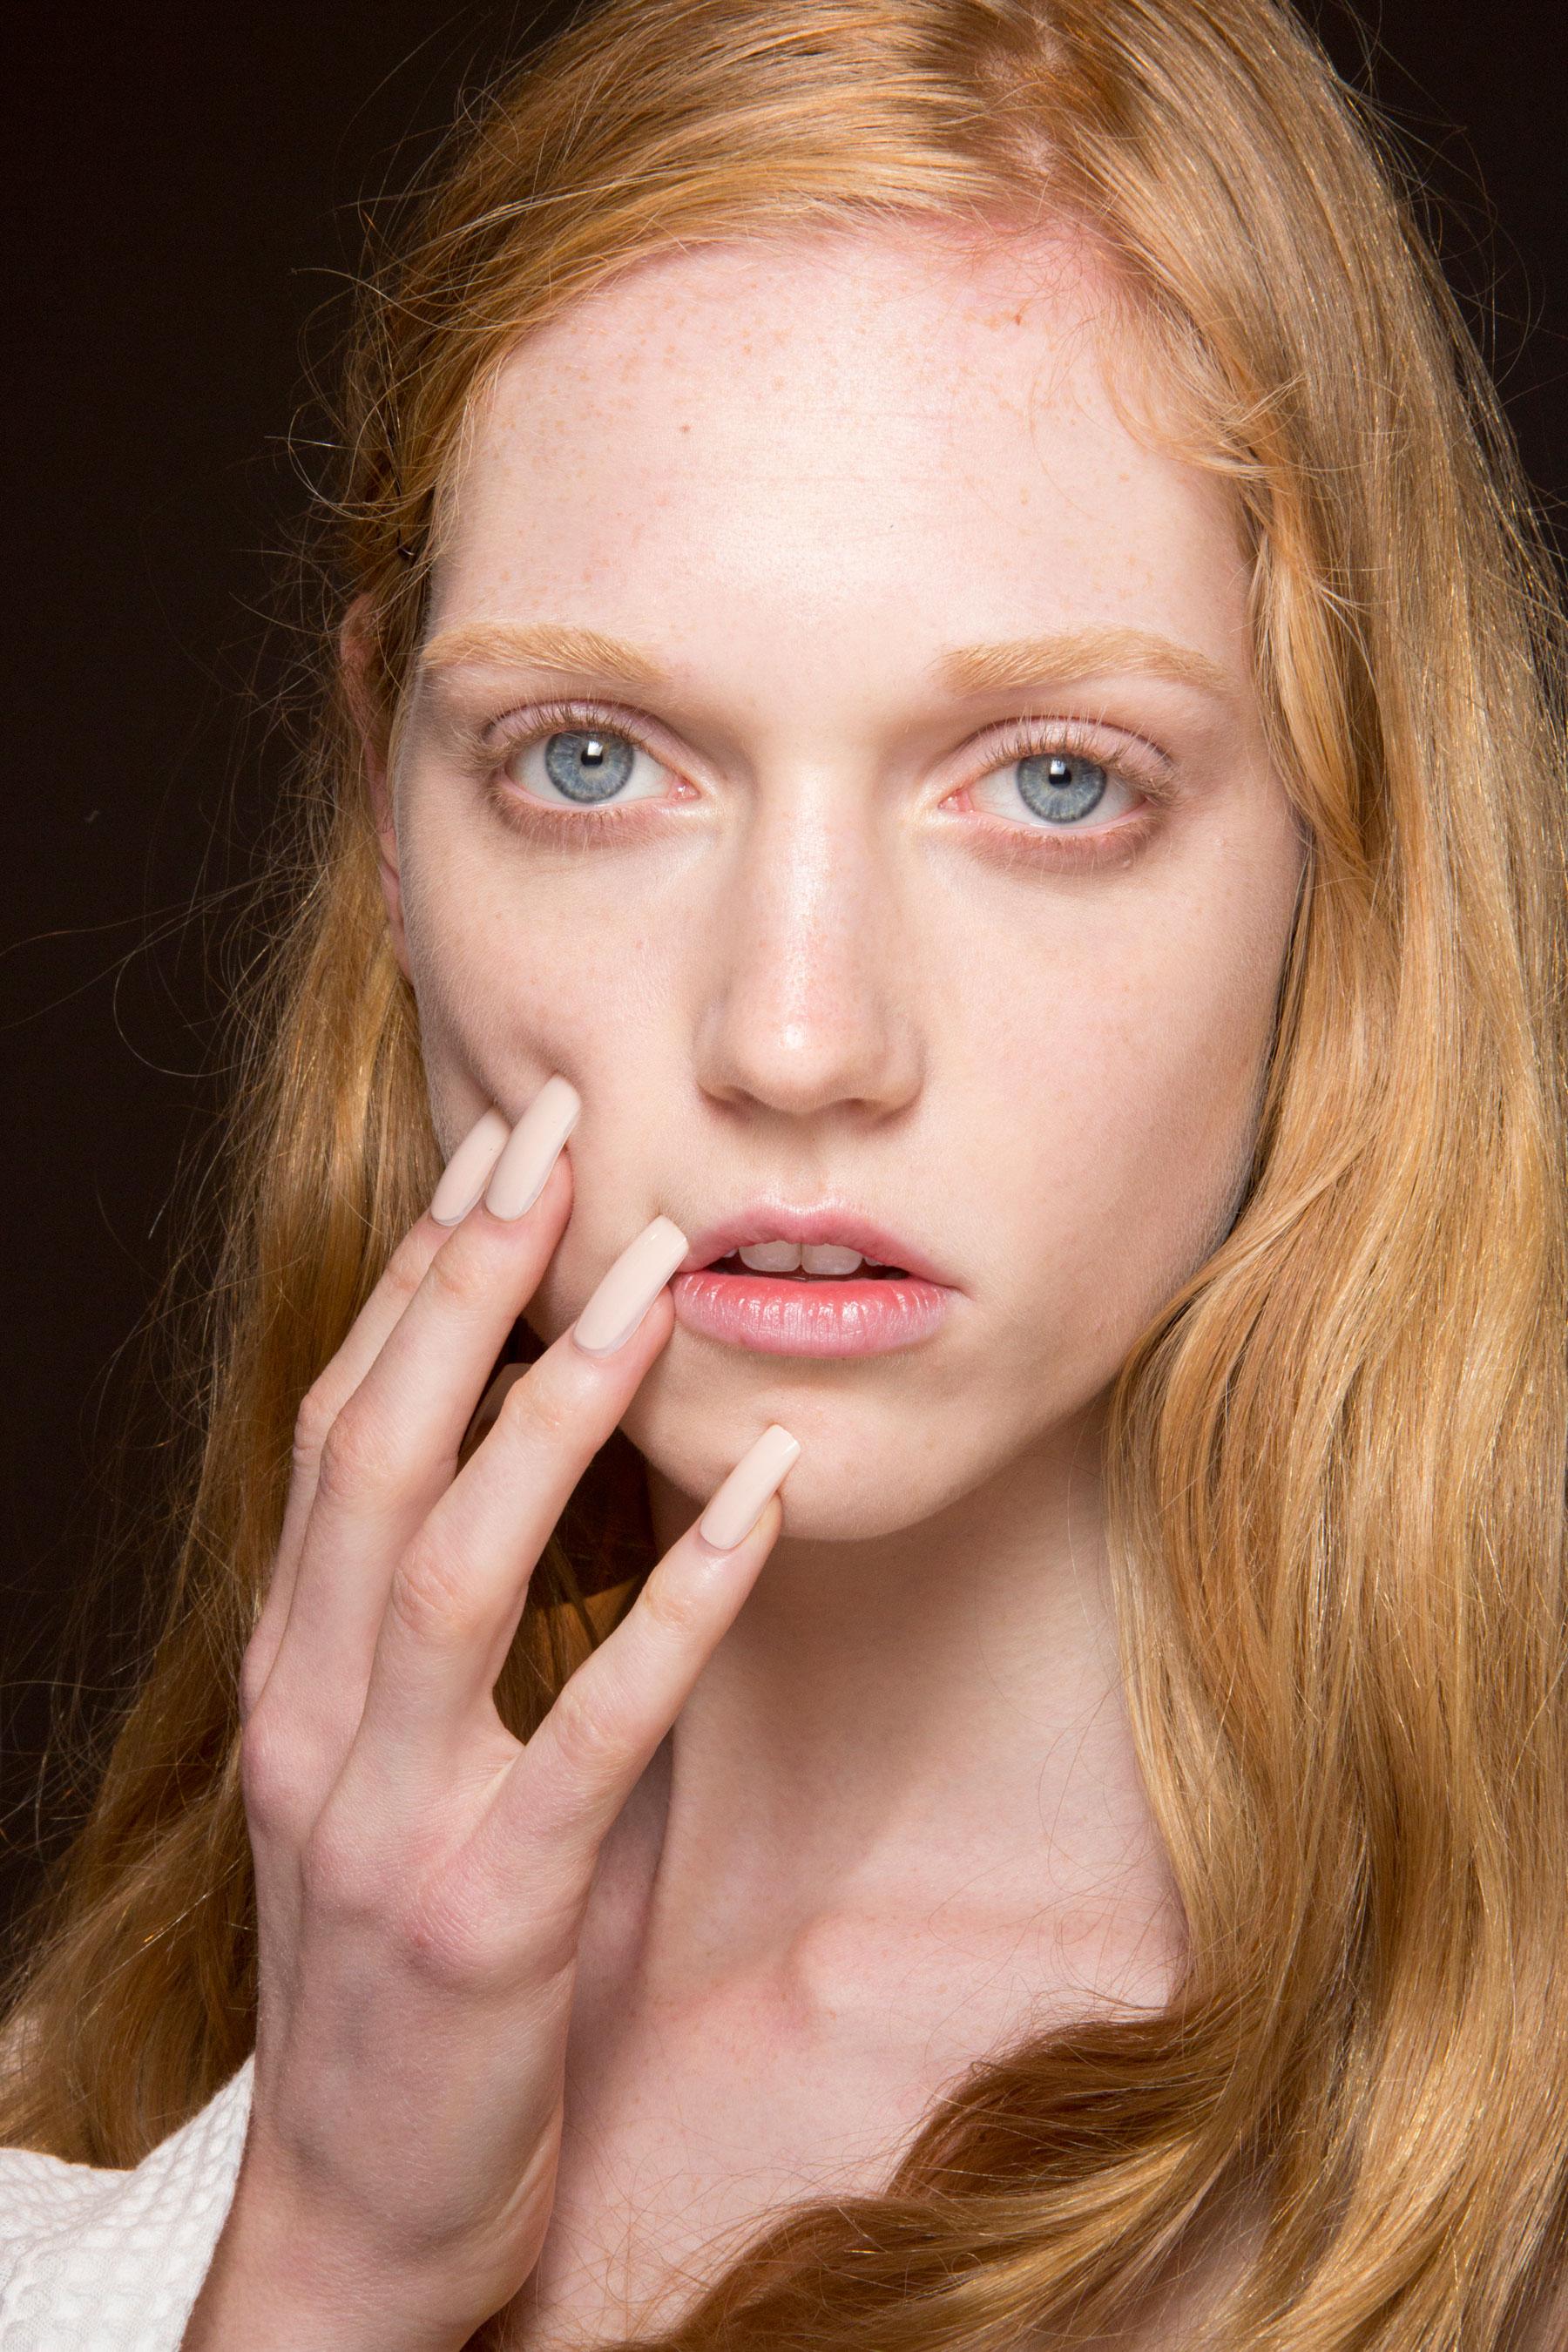 Gucci0-backsatge-beauty-spring-2016-fashion-show-the-impression-070